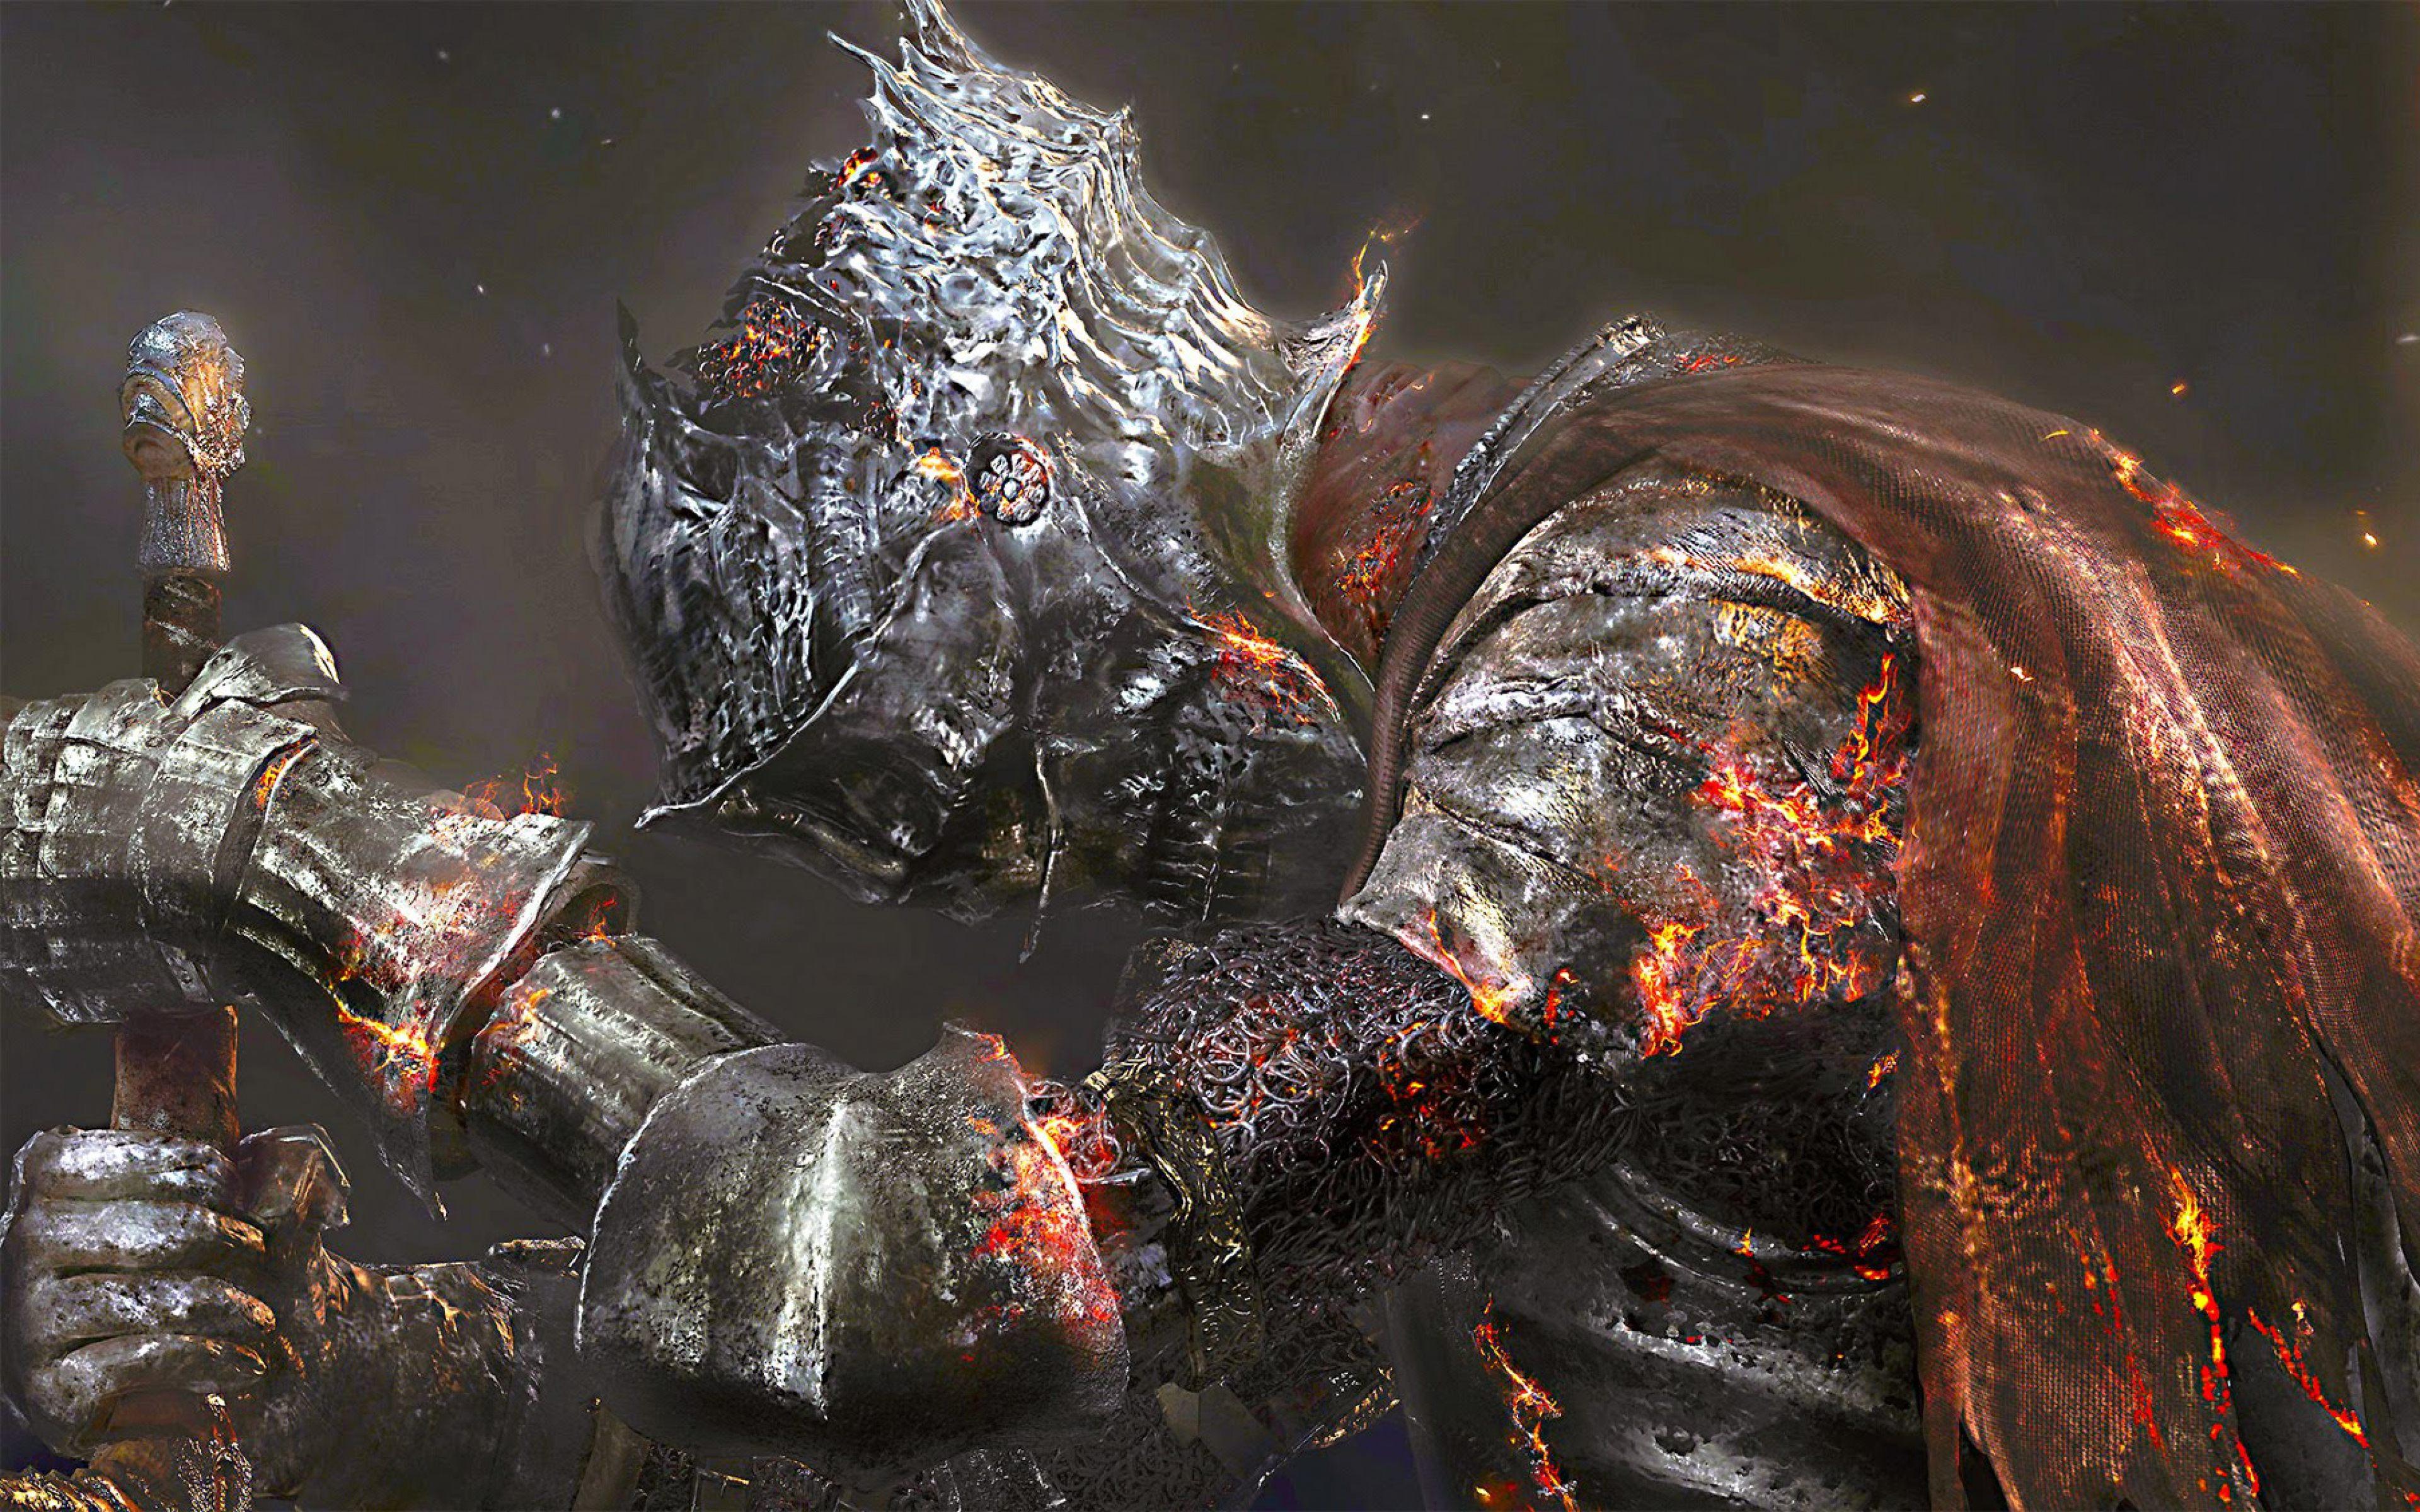 Dark Souls 3 4k Wallpaper: Dark 4K Wallpapers